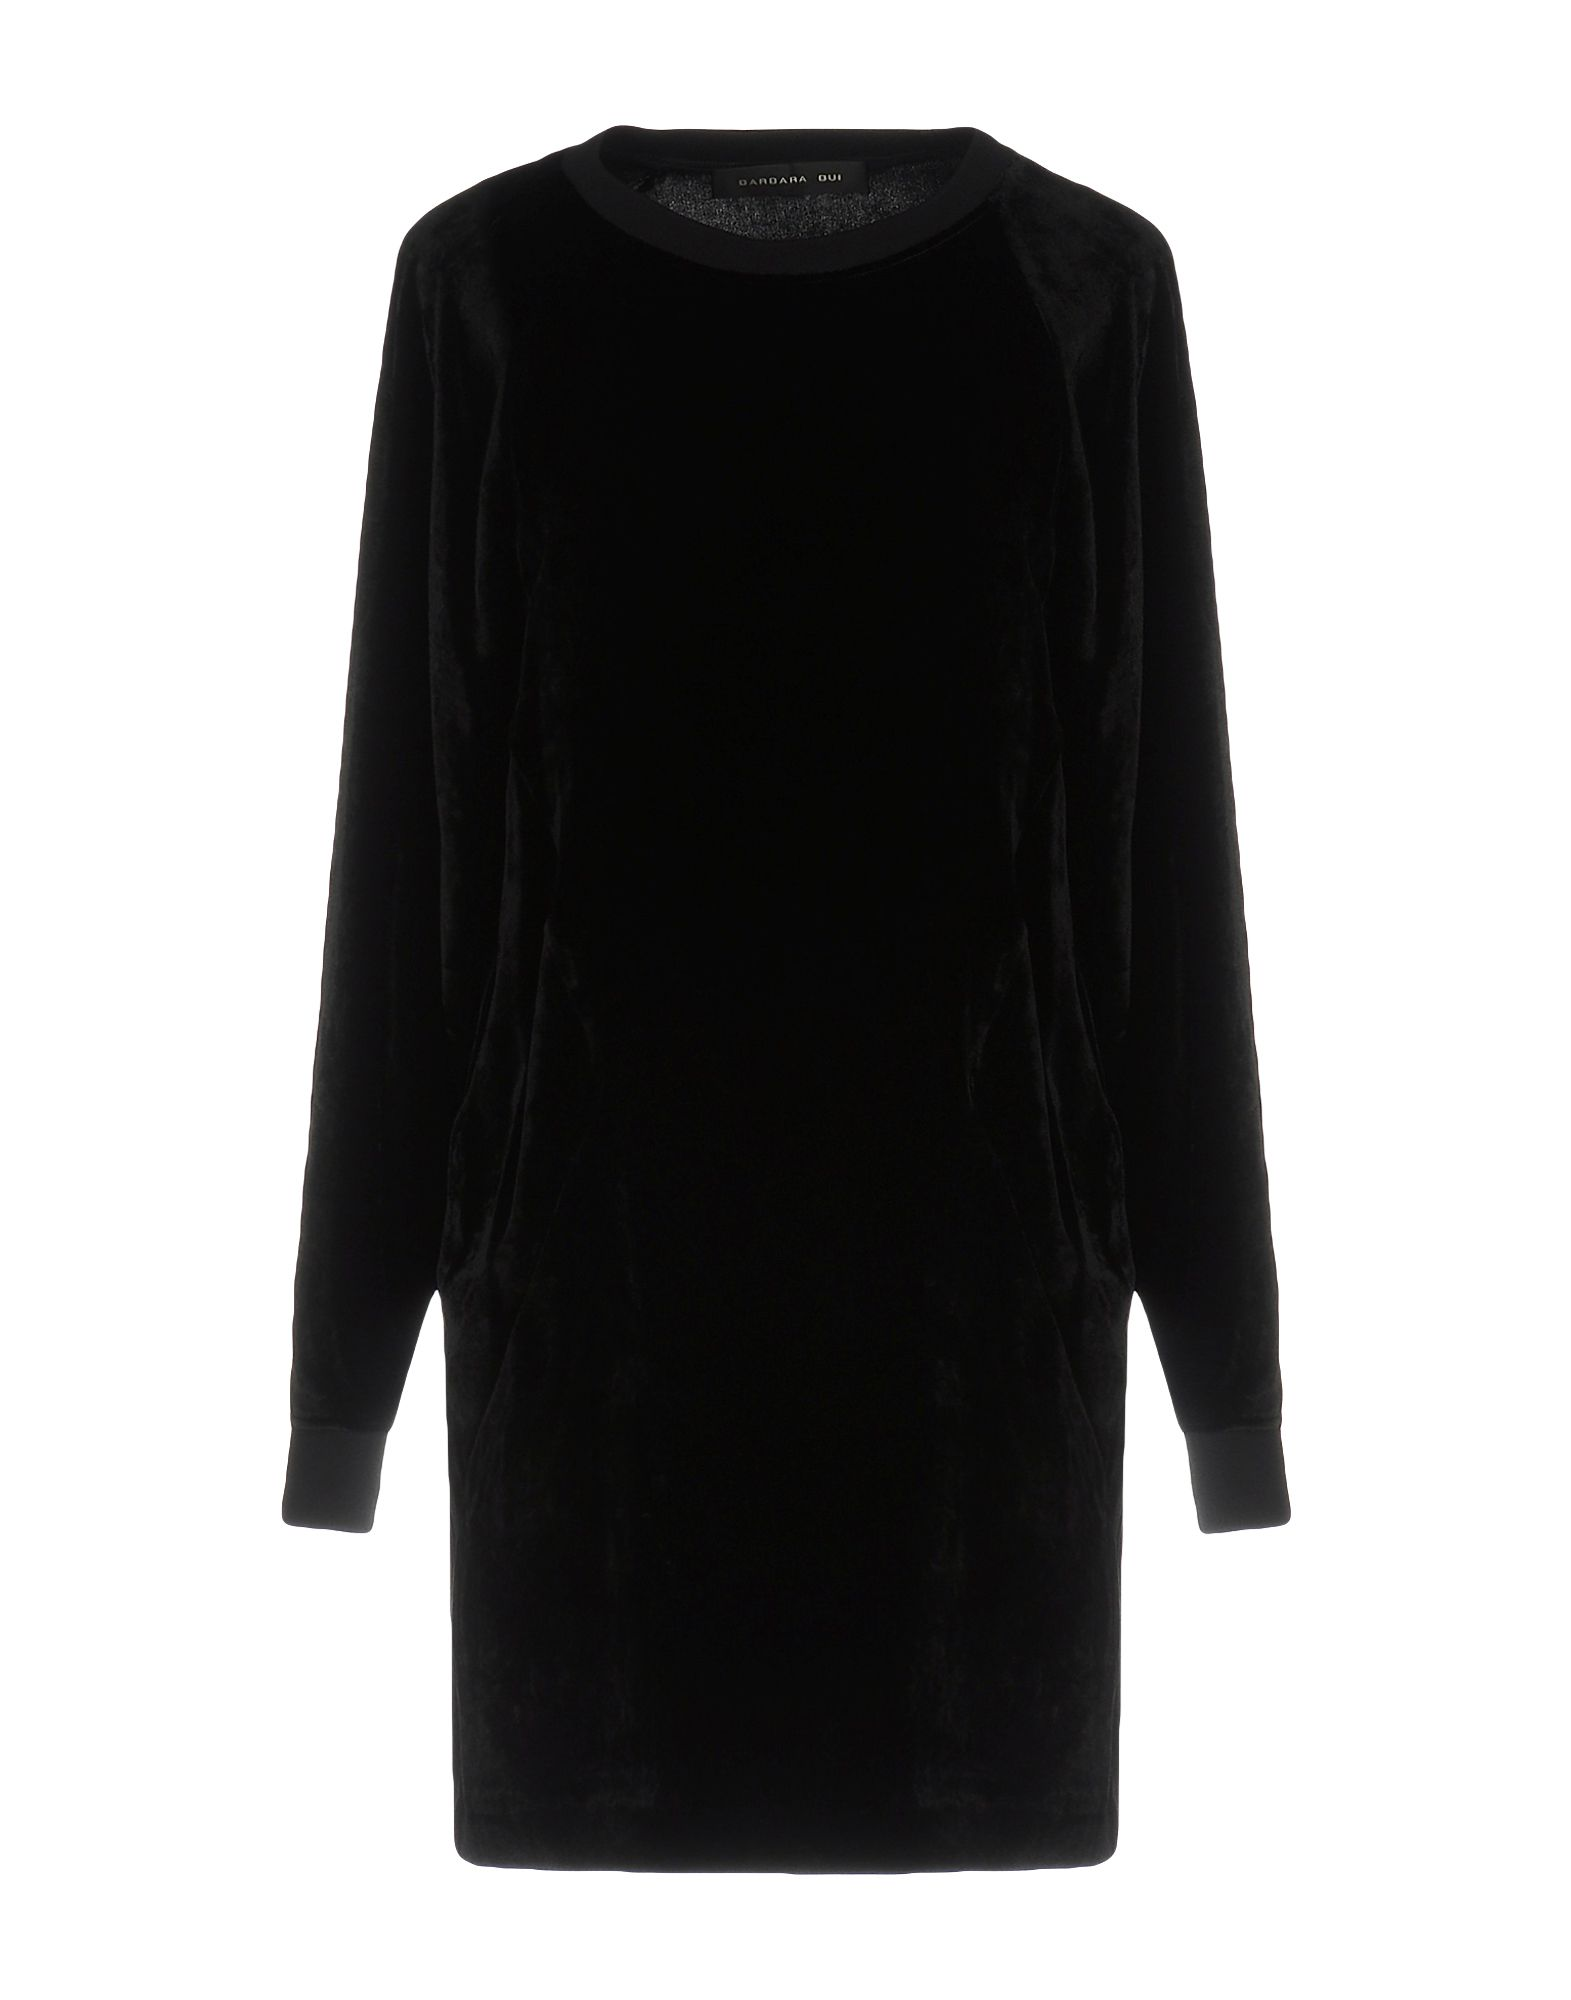 BARBARA BUI Короткое платье платье barbara bettoni vienna цвет мятный bb153 размер xl 50